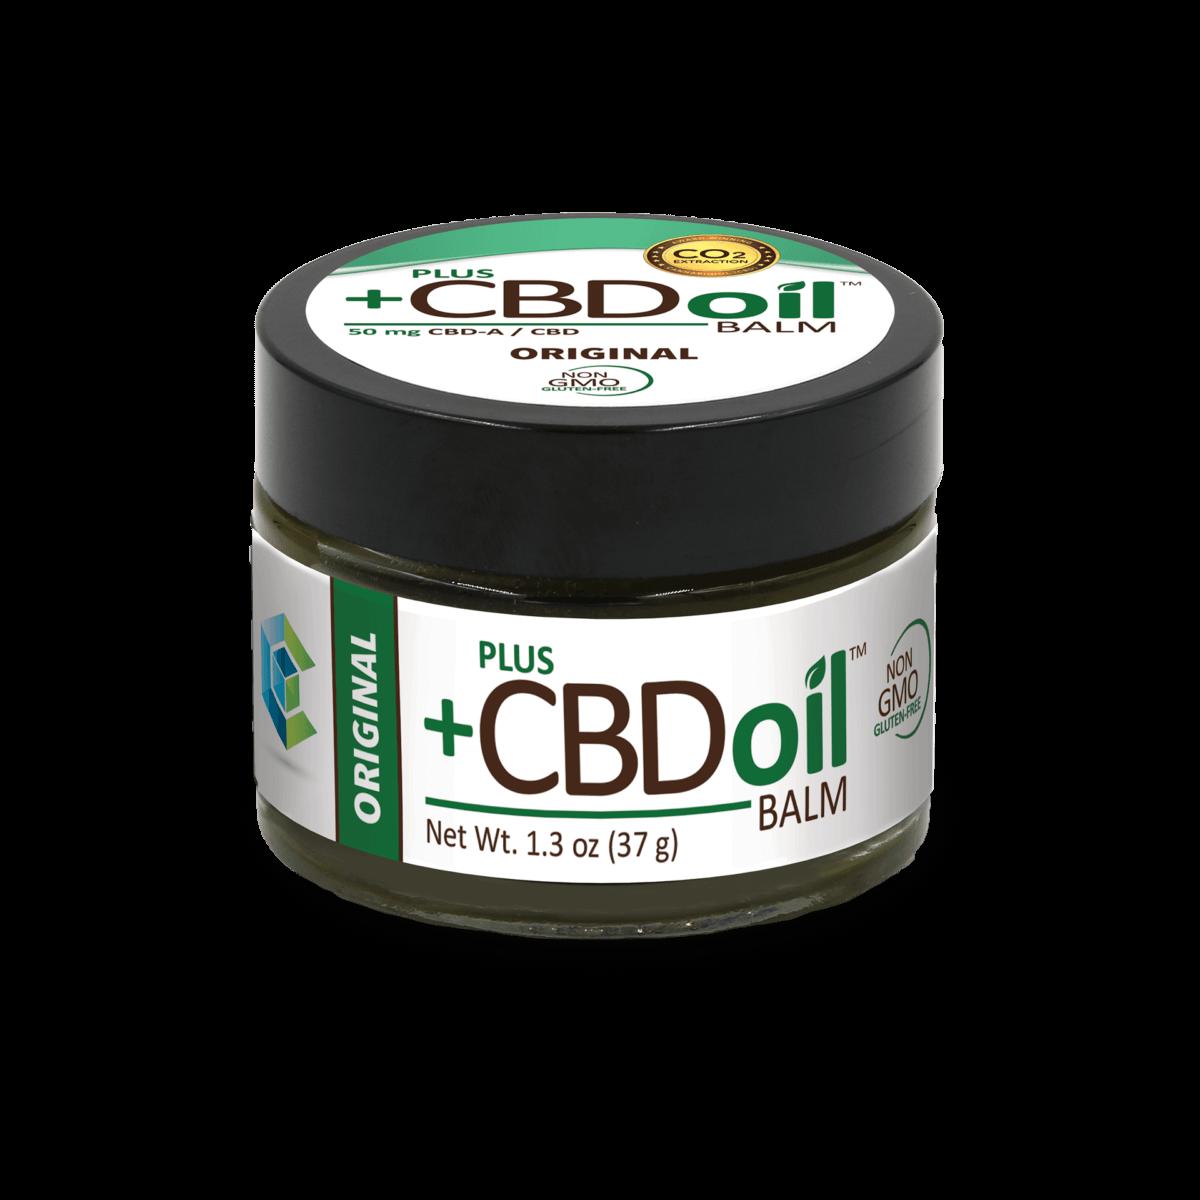 Plus CBD Oil Balm 50 mg